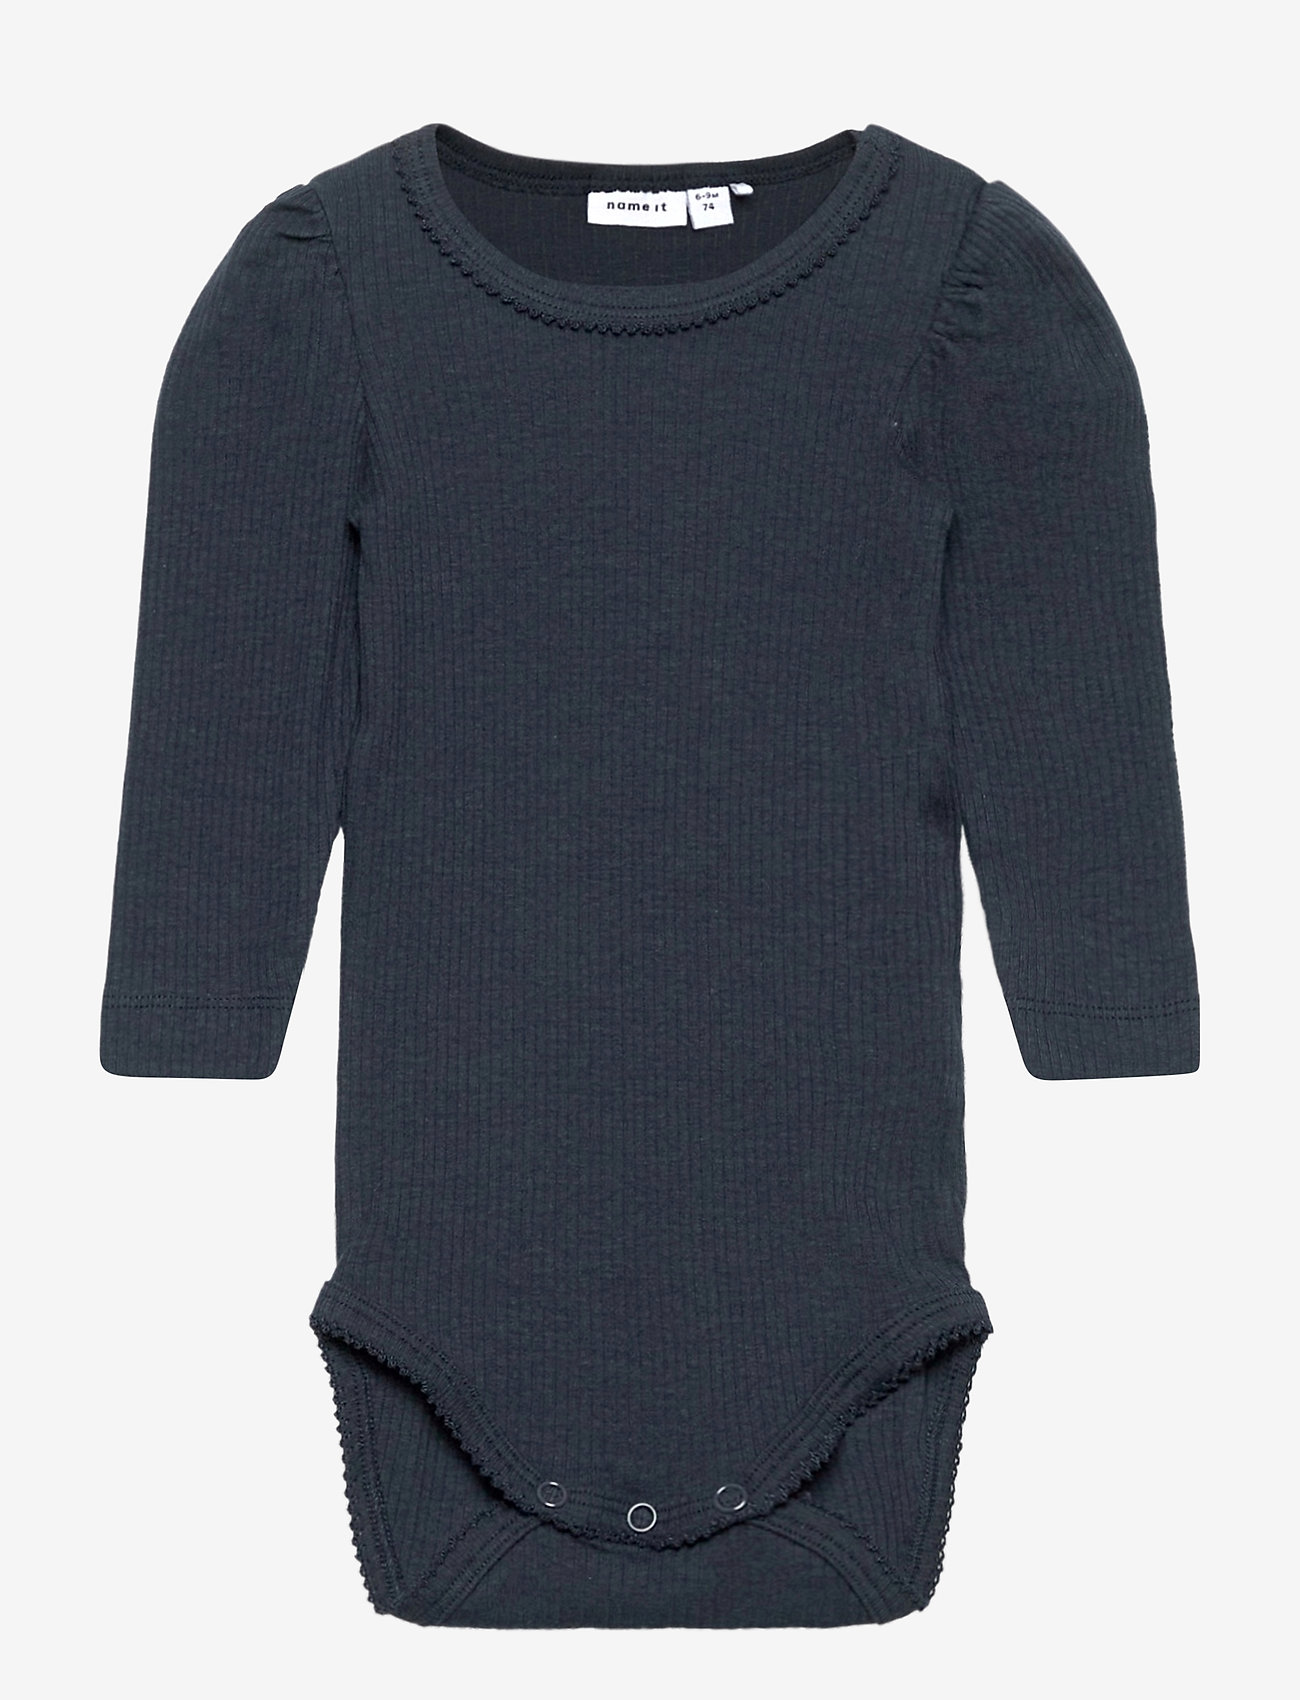 Baby Bodysuit Cotton Black